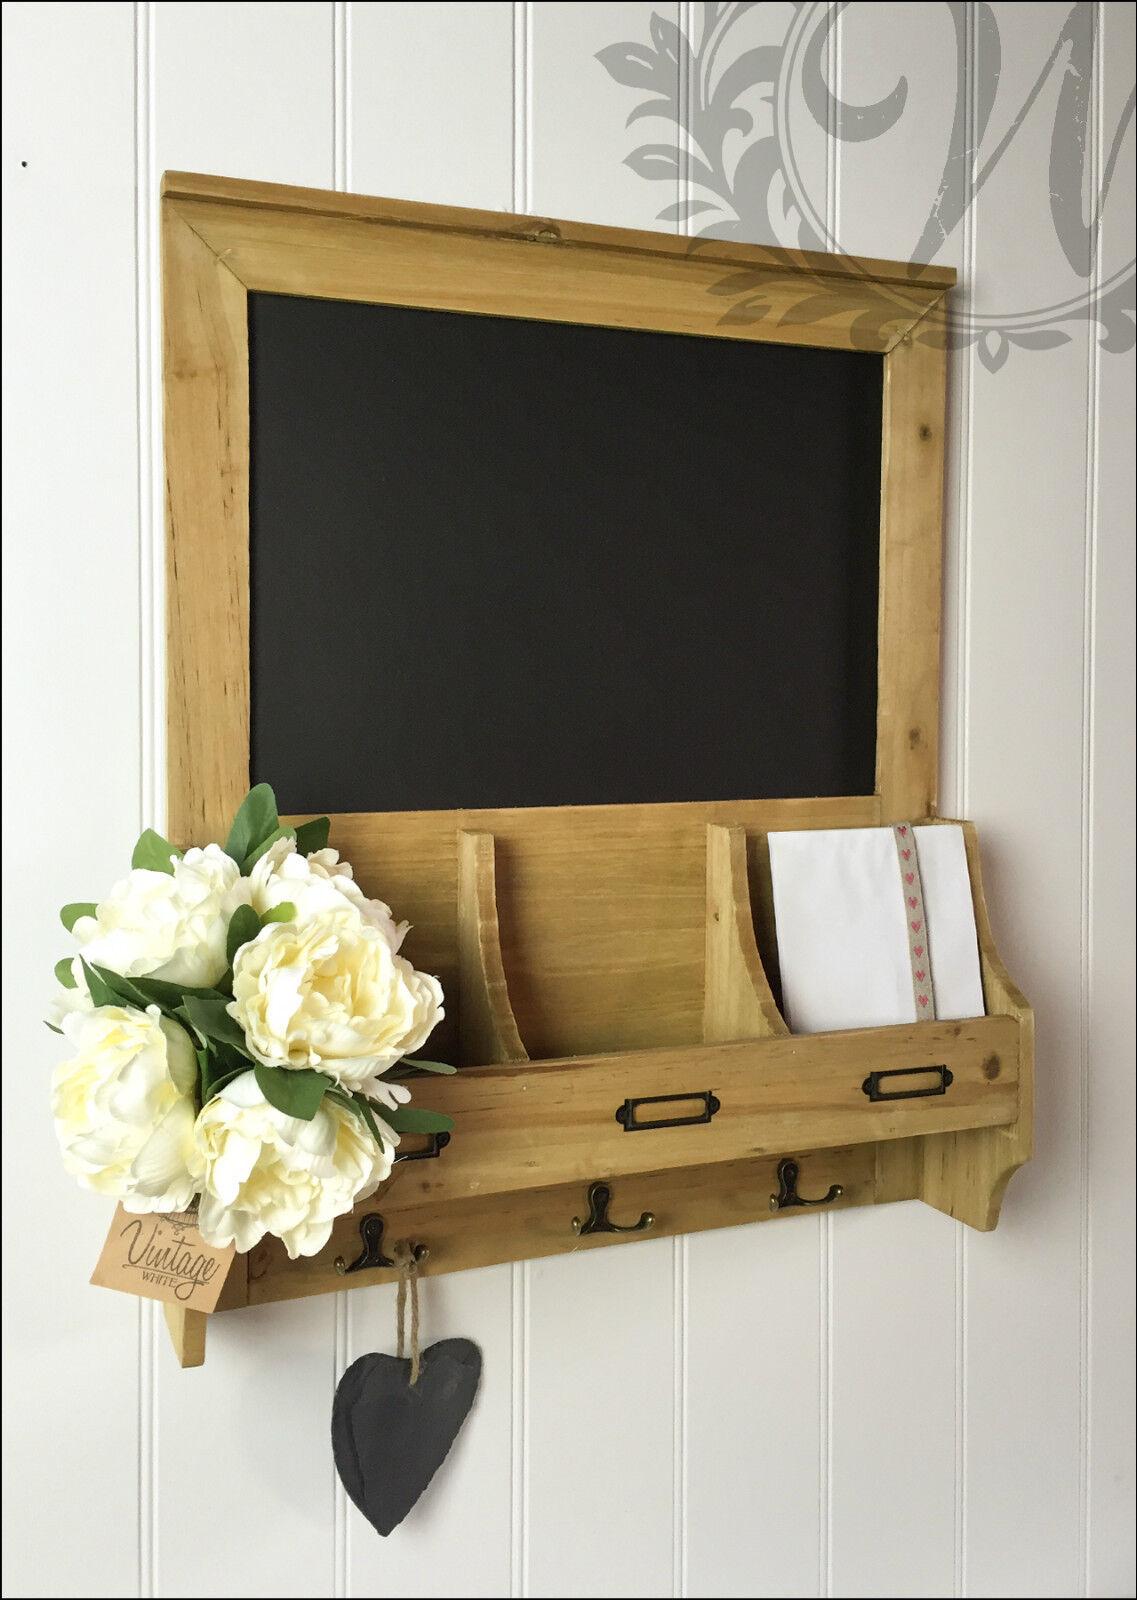 Vintage Blackboard Shabby Chic Memo Notice Wooden Chalk